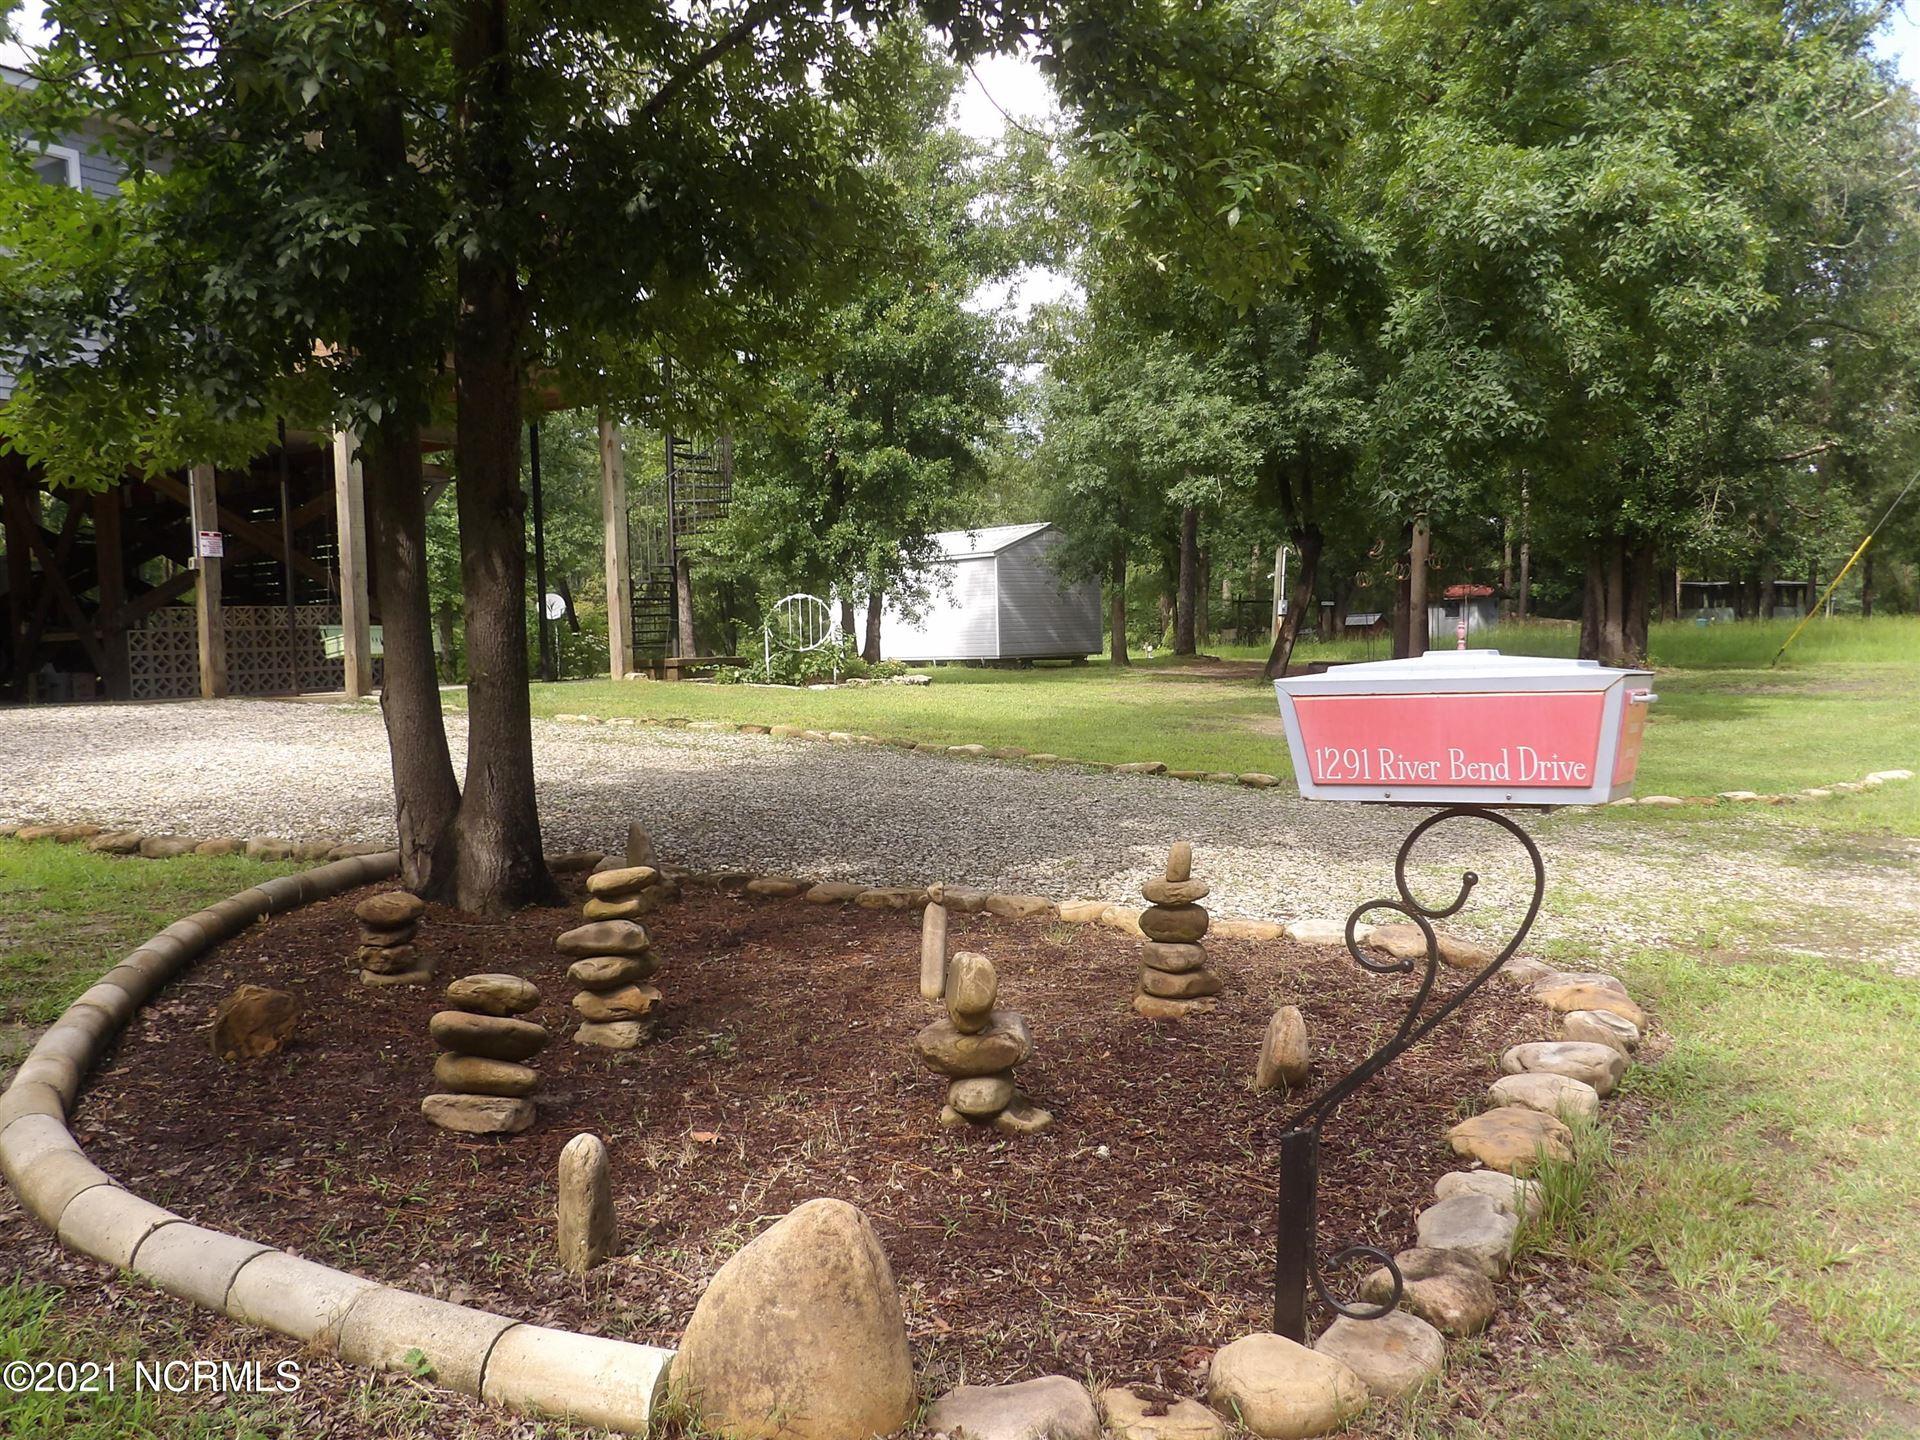 Photo of 1291 Riverbend Drive, Burgaw, NC 28425 (MLS # 100280660)